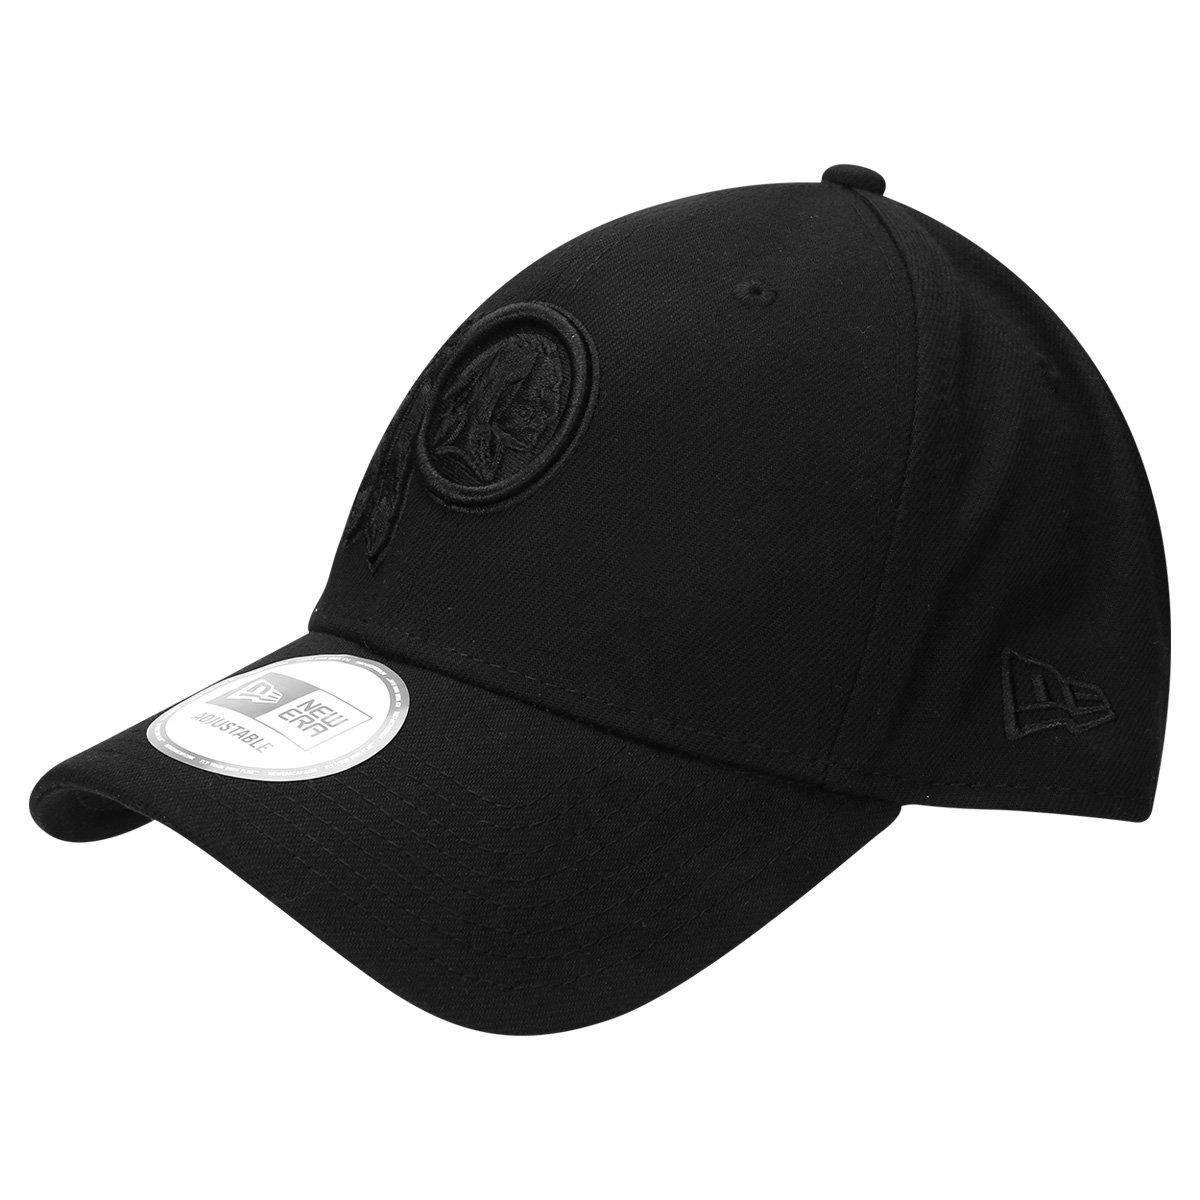 4ded46bdf Boné New Era 940 Hc Sn Black On Black Washington Redskins - Compre Agora